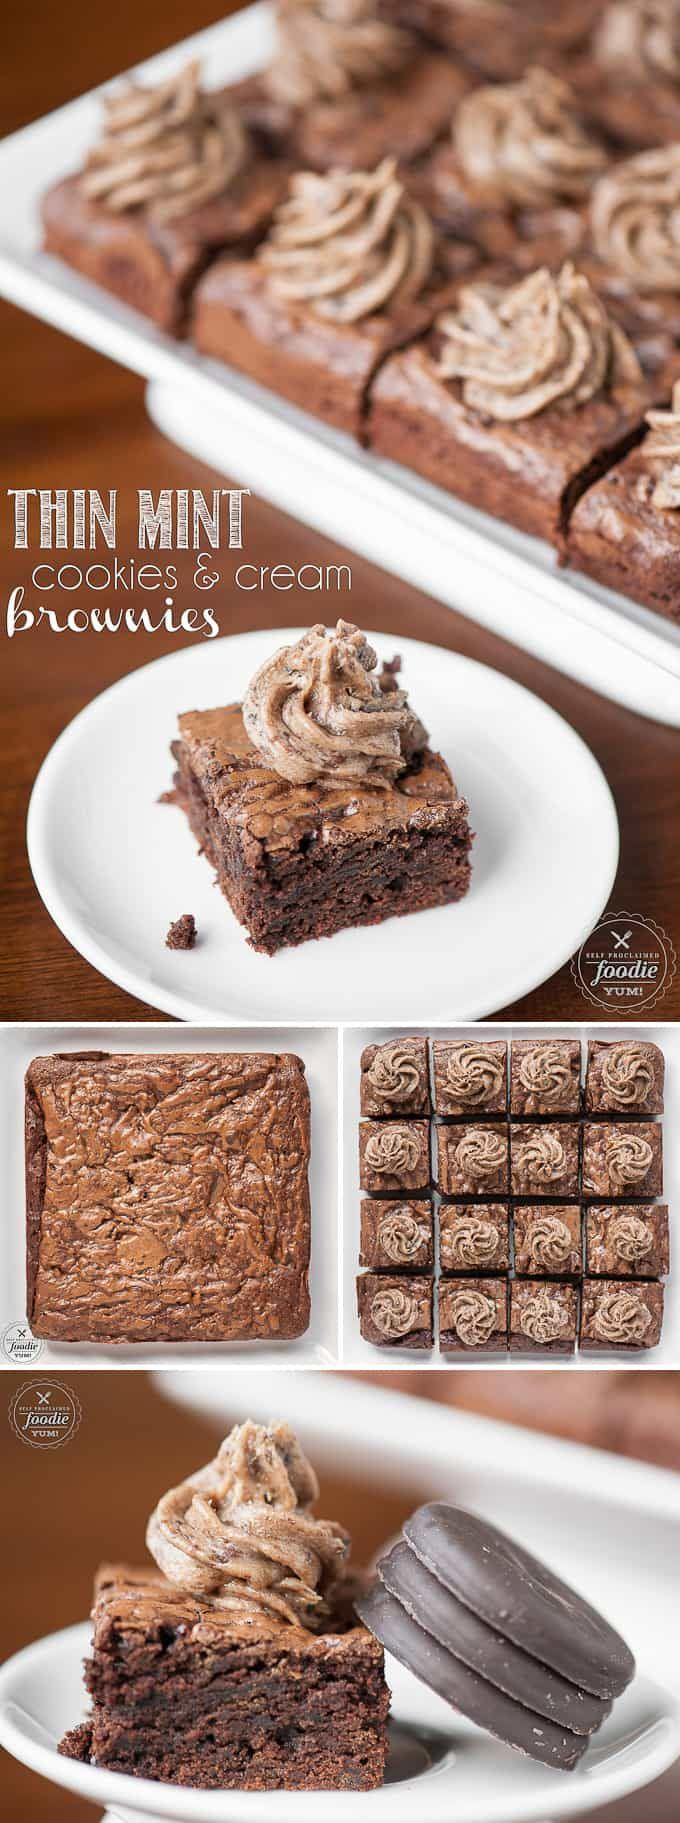 Thin Mint Cookies & Cream Brownies | Self Proclaimed ...